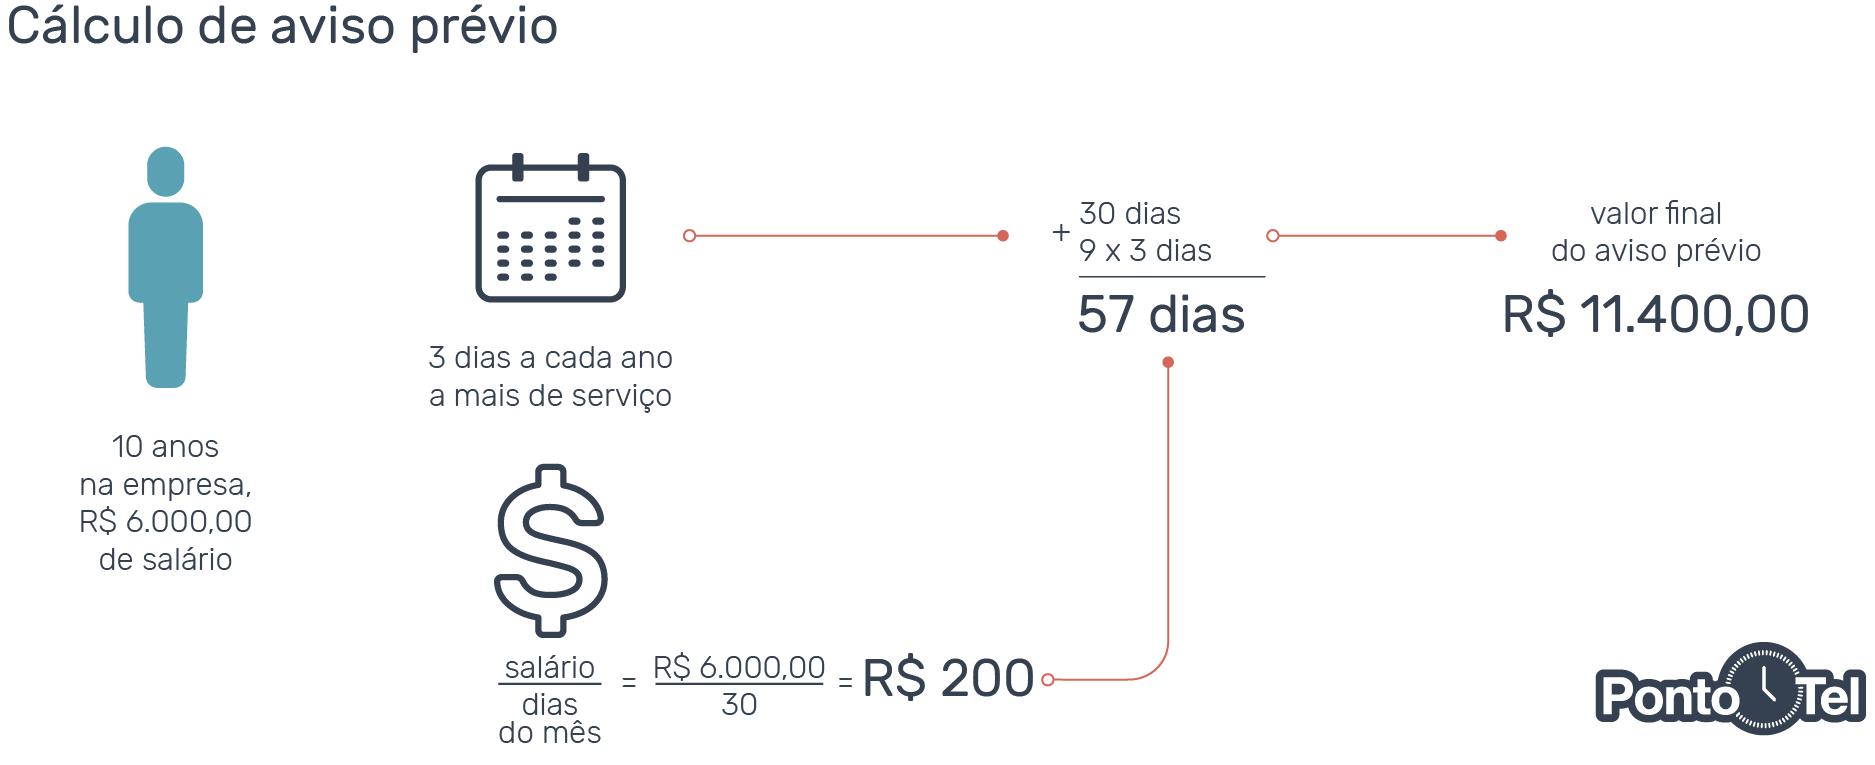 aviso-previo-calculo_final